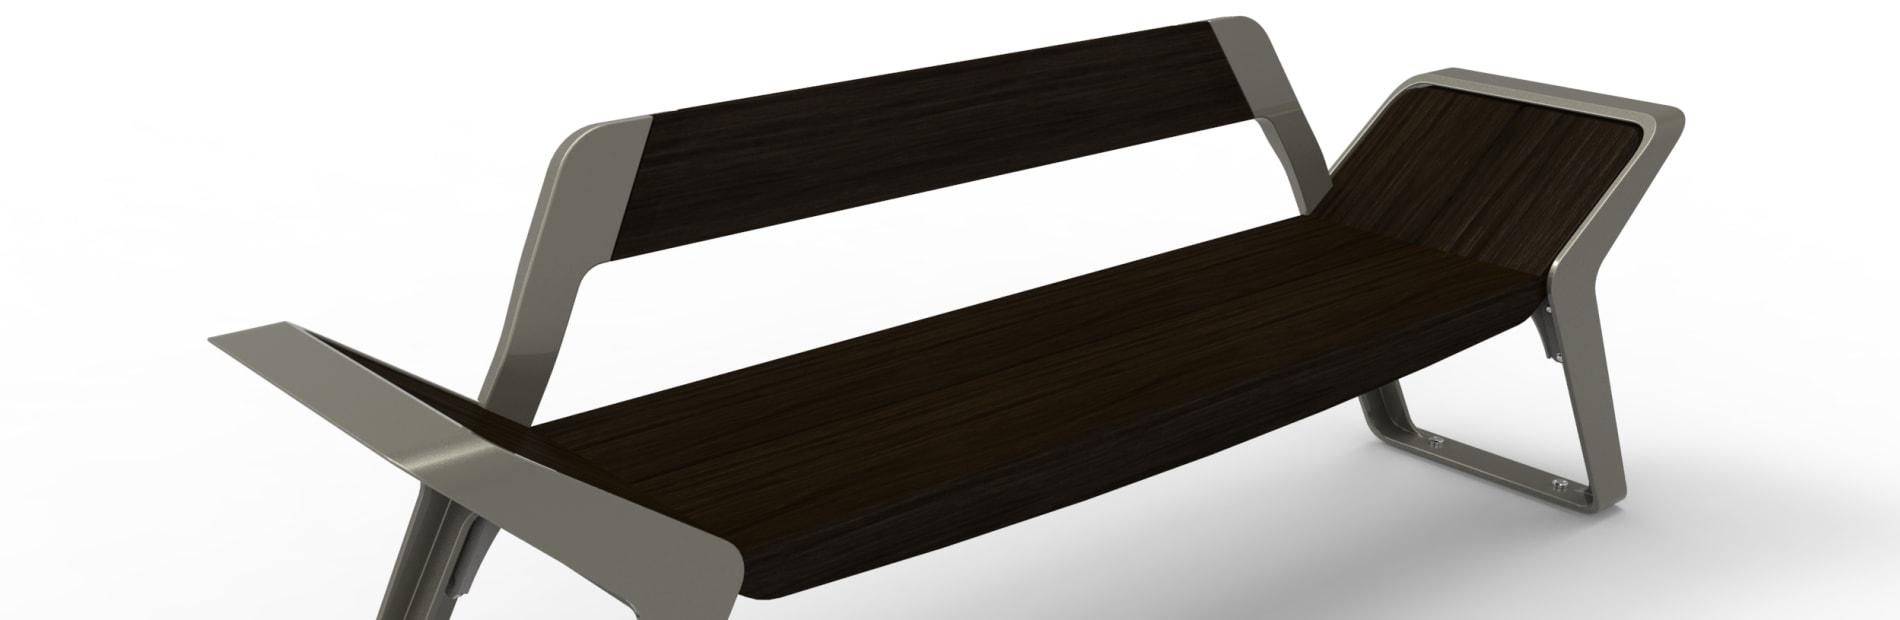 stratic seat - onyx and quartz